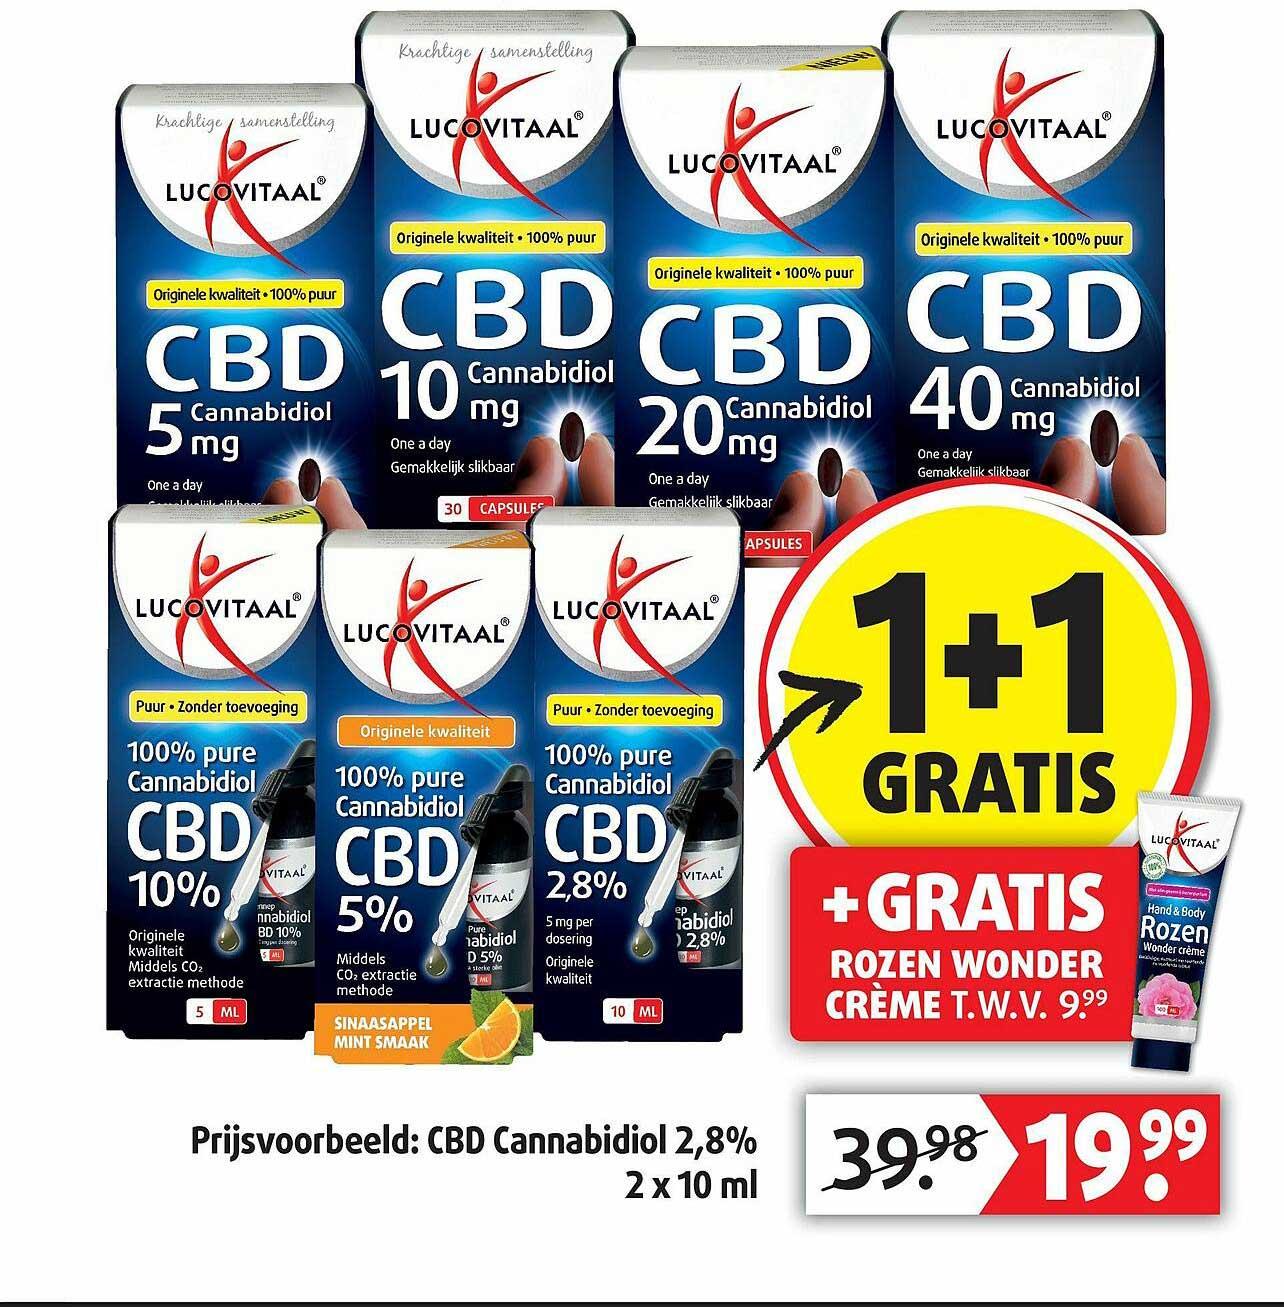 Lucovitaal Lucovitaal CBD Cannabidiol 2,8% 1+1 Gratis